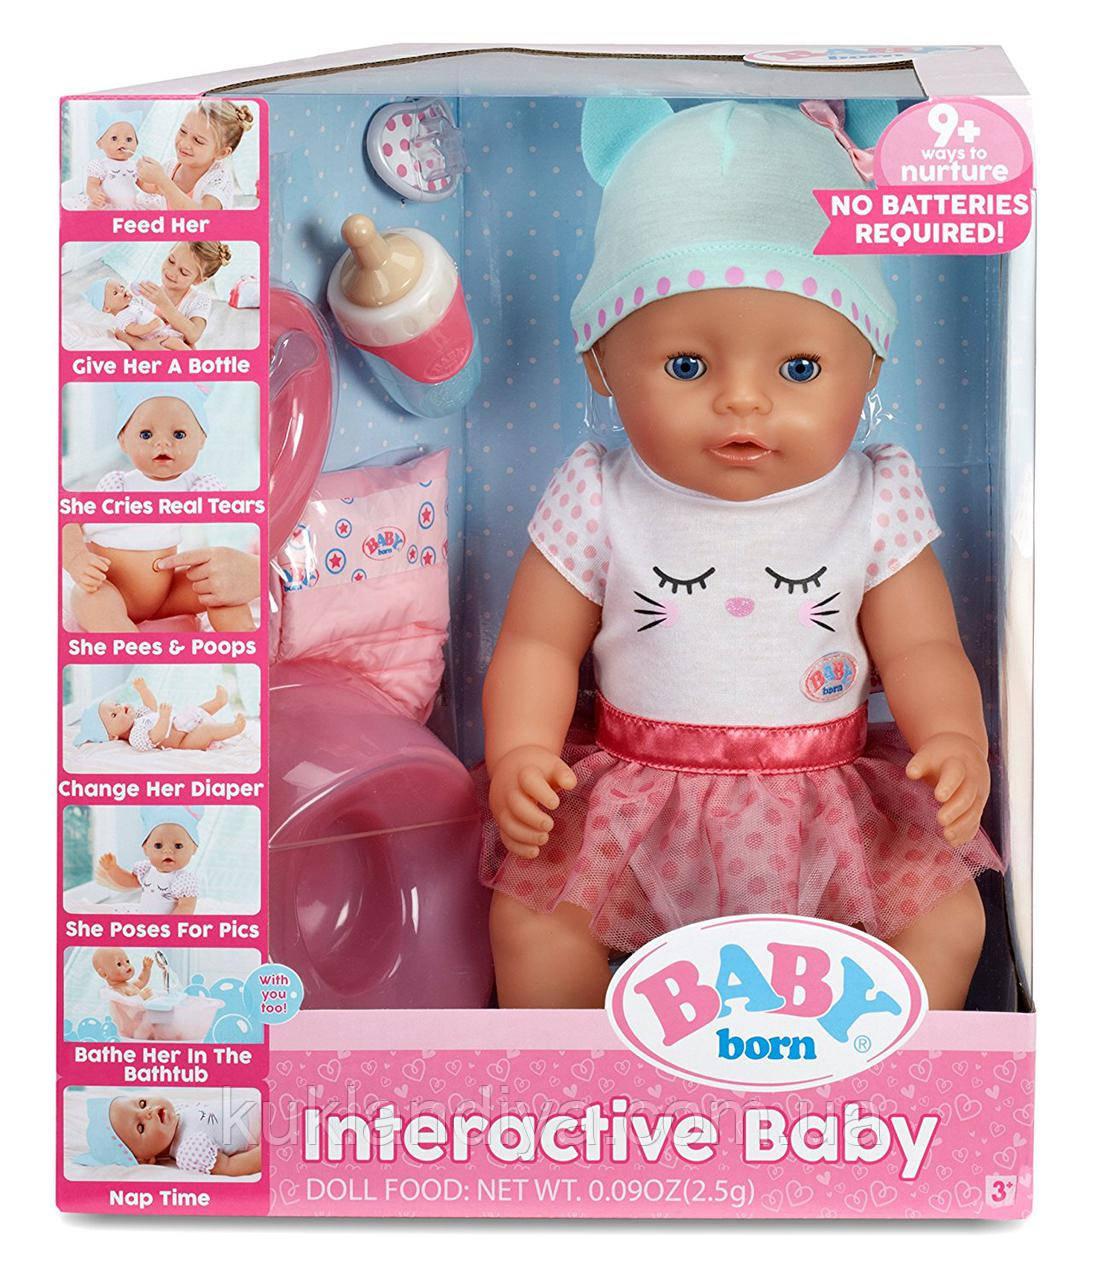 Baby Born Interactive Baby Doll Интерактивная Кукла Пупс Голубые Глаза